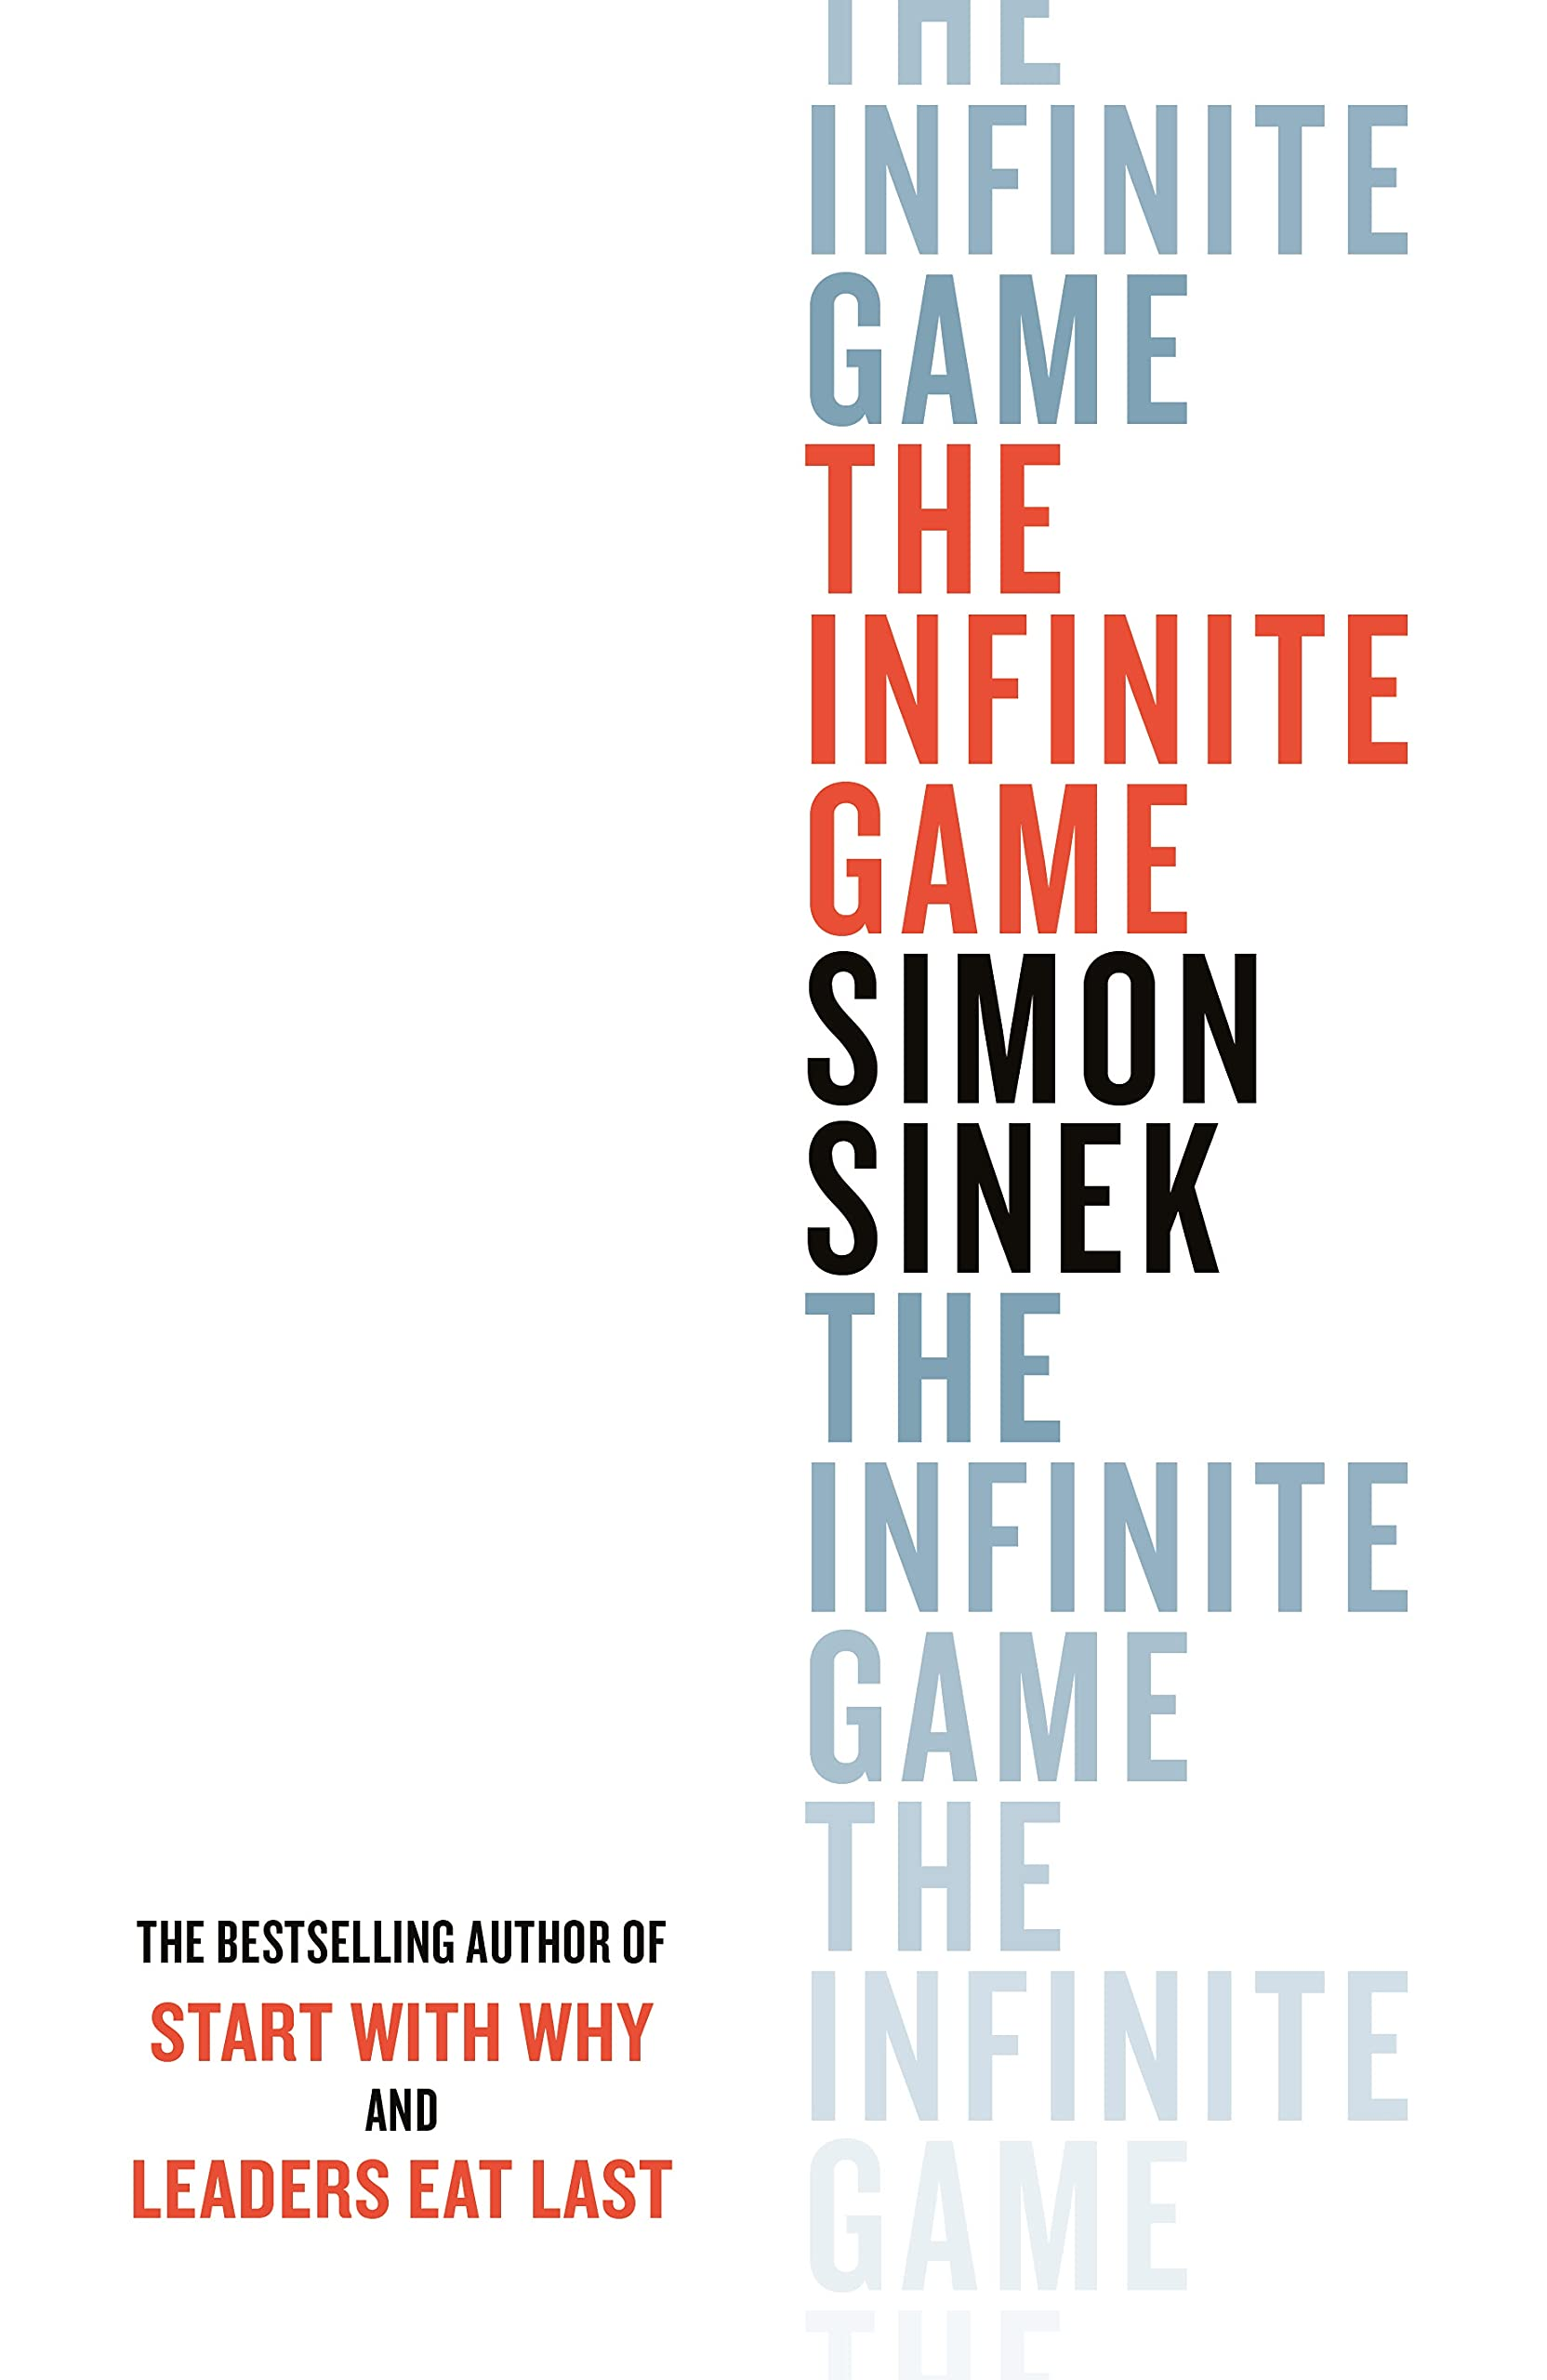 The Infinite Game: Sinek, Simon: 9780241295595: Amazon.com: Books